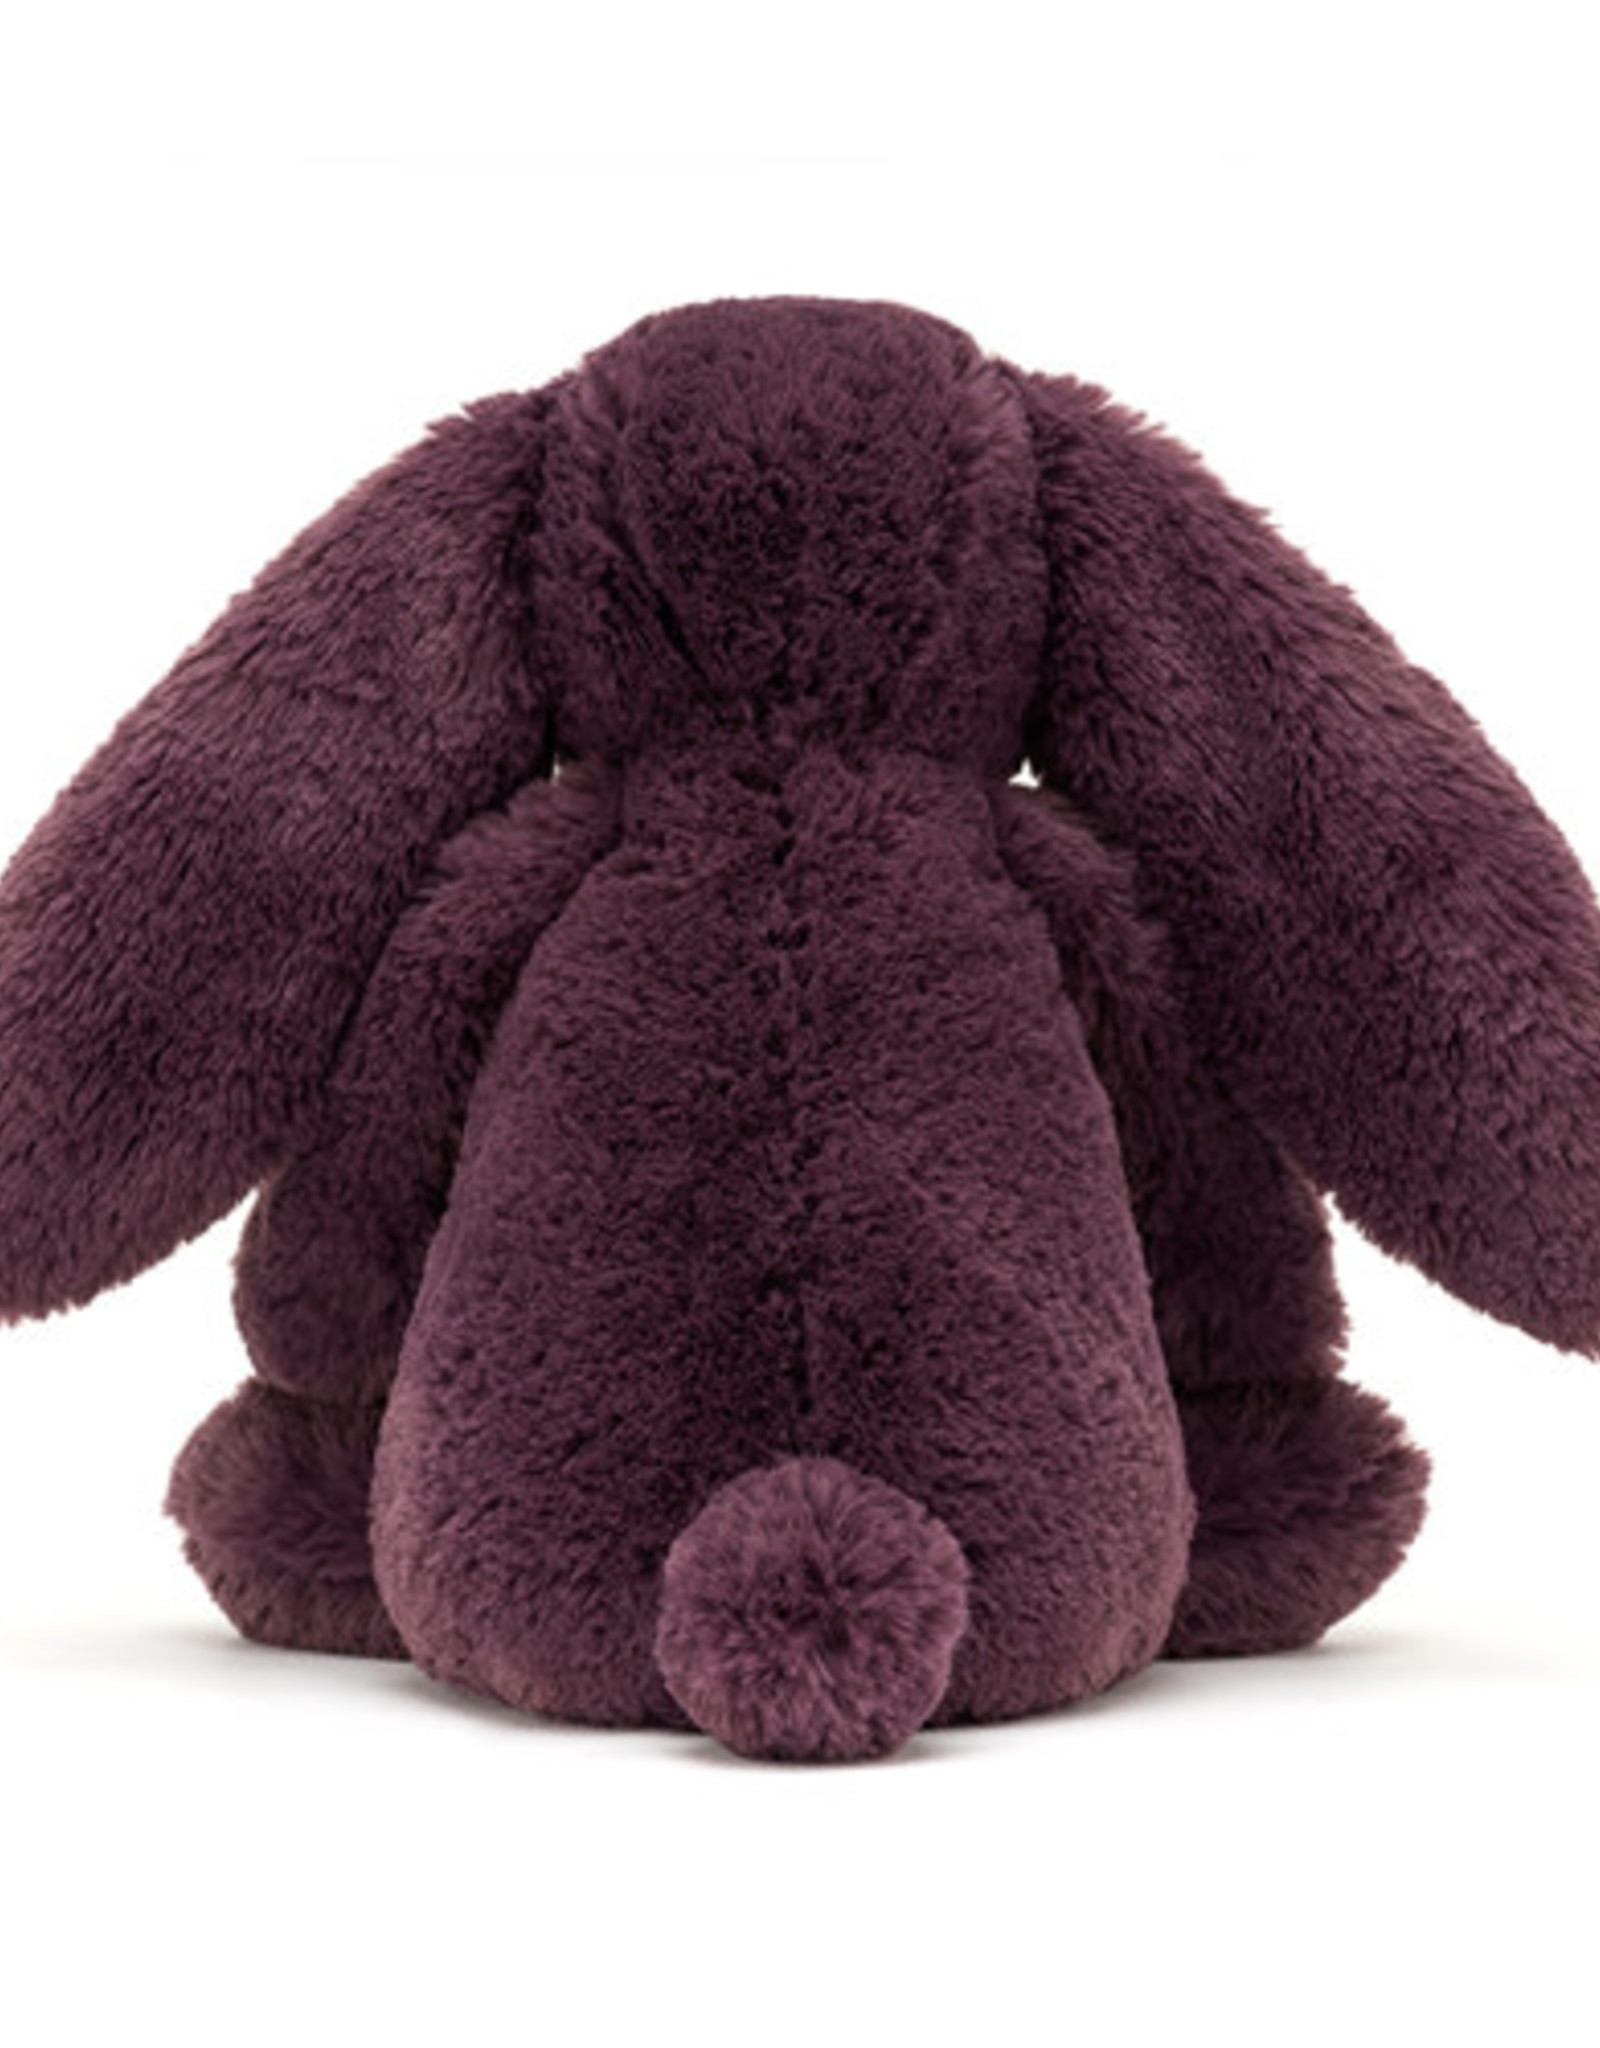 Jellycat Bashful Bunny Plum S